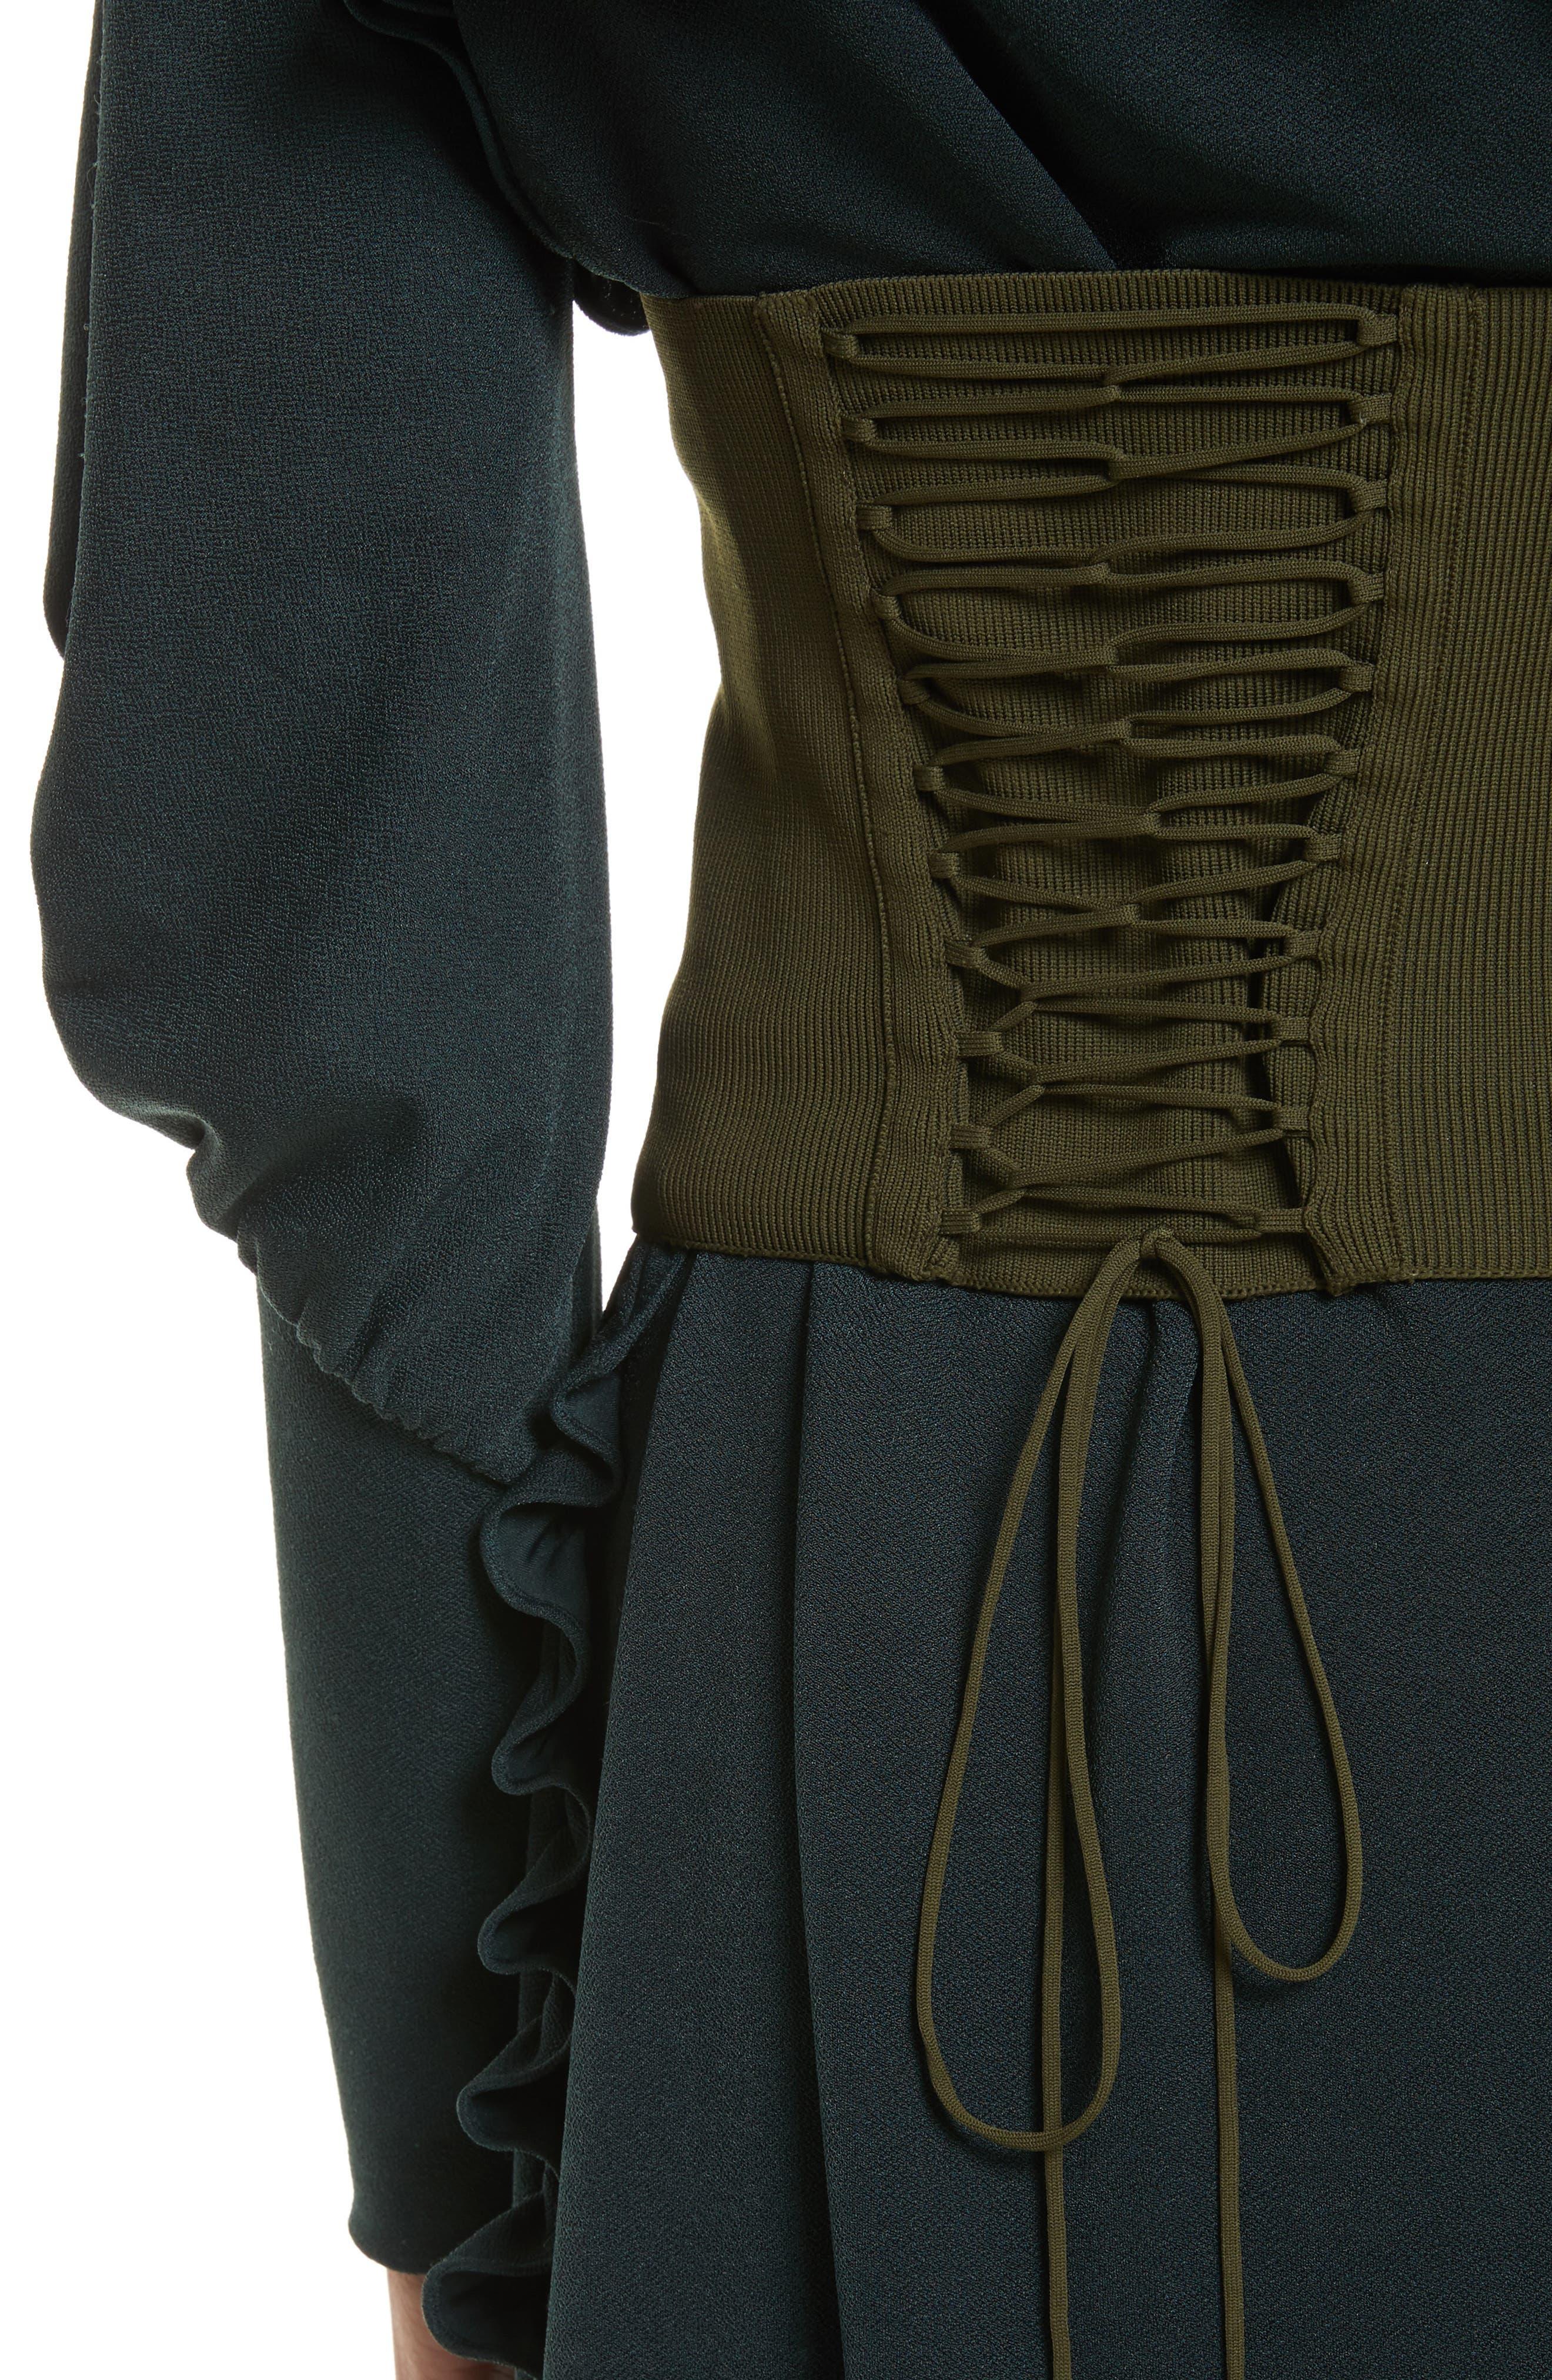 Lace-Up Knit Corset,                             Alternate thumbnail 4, color,                             Loden